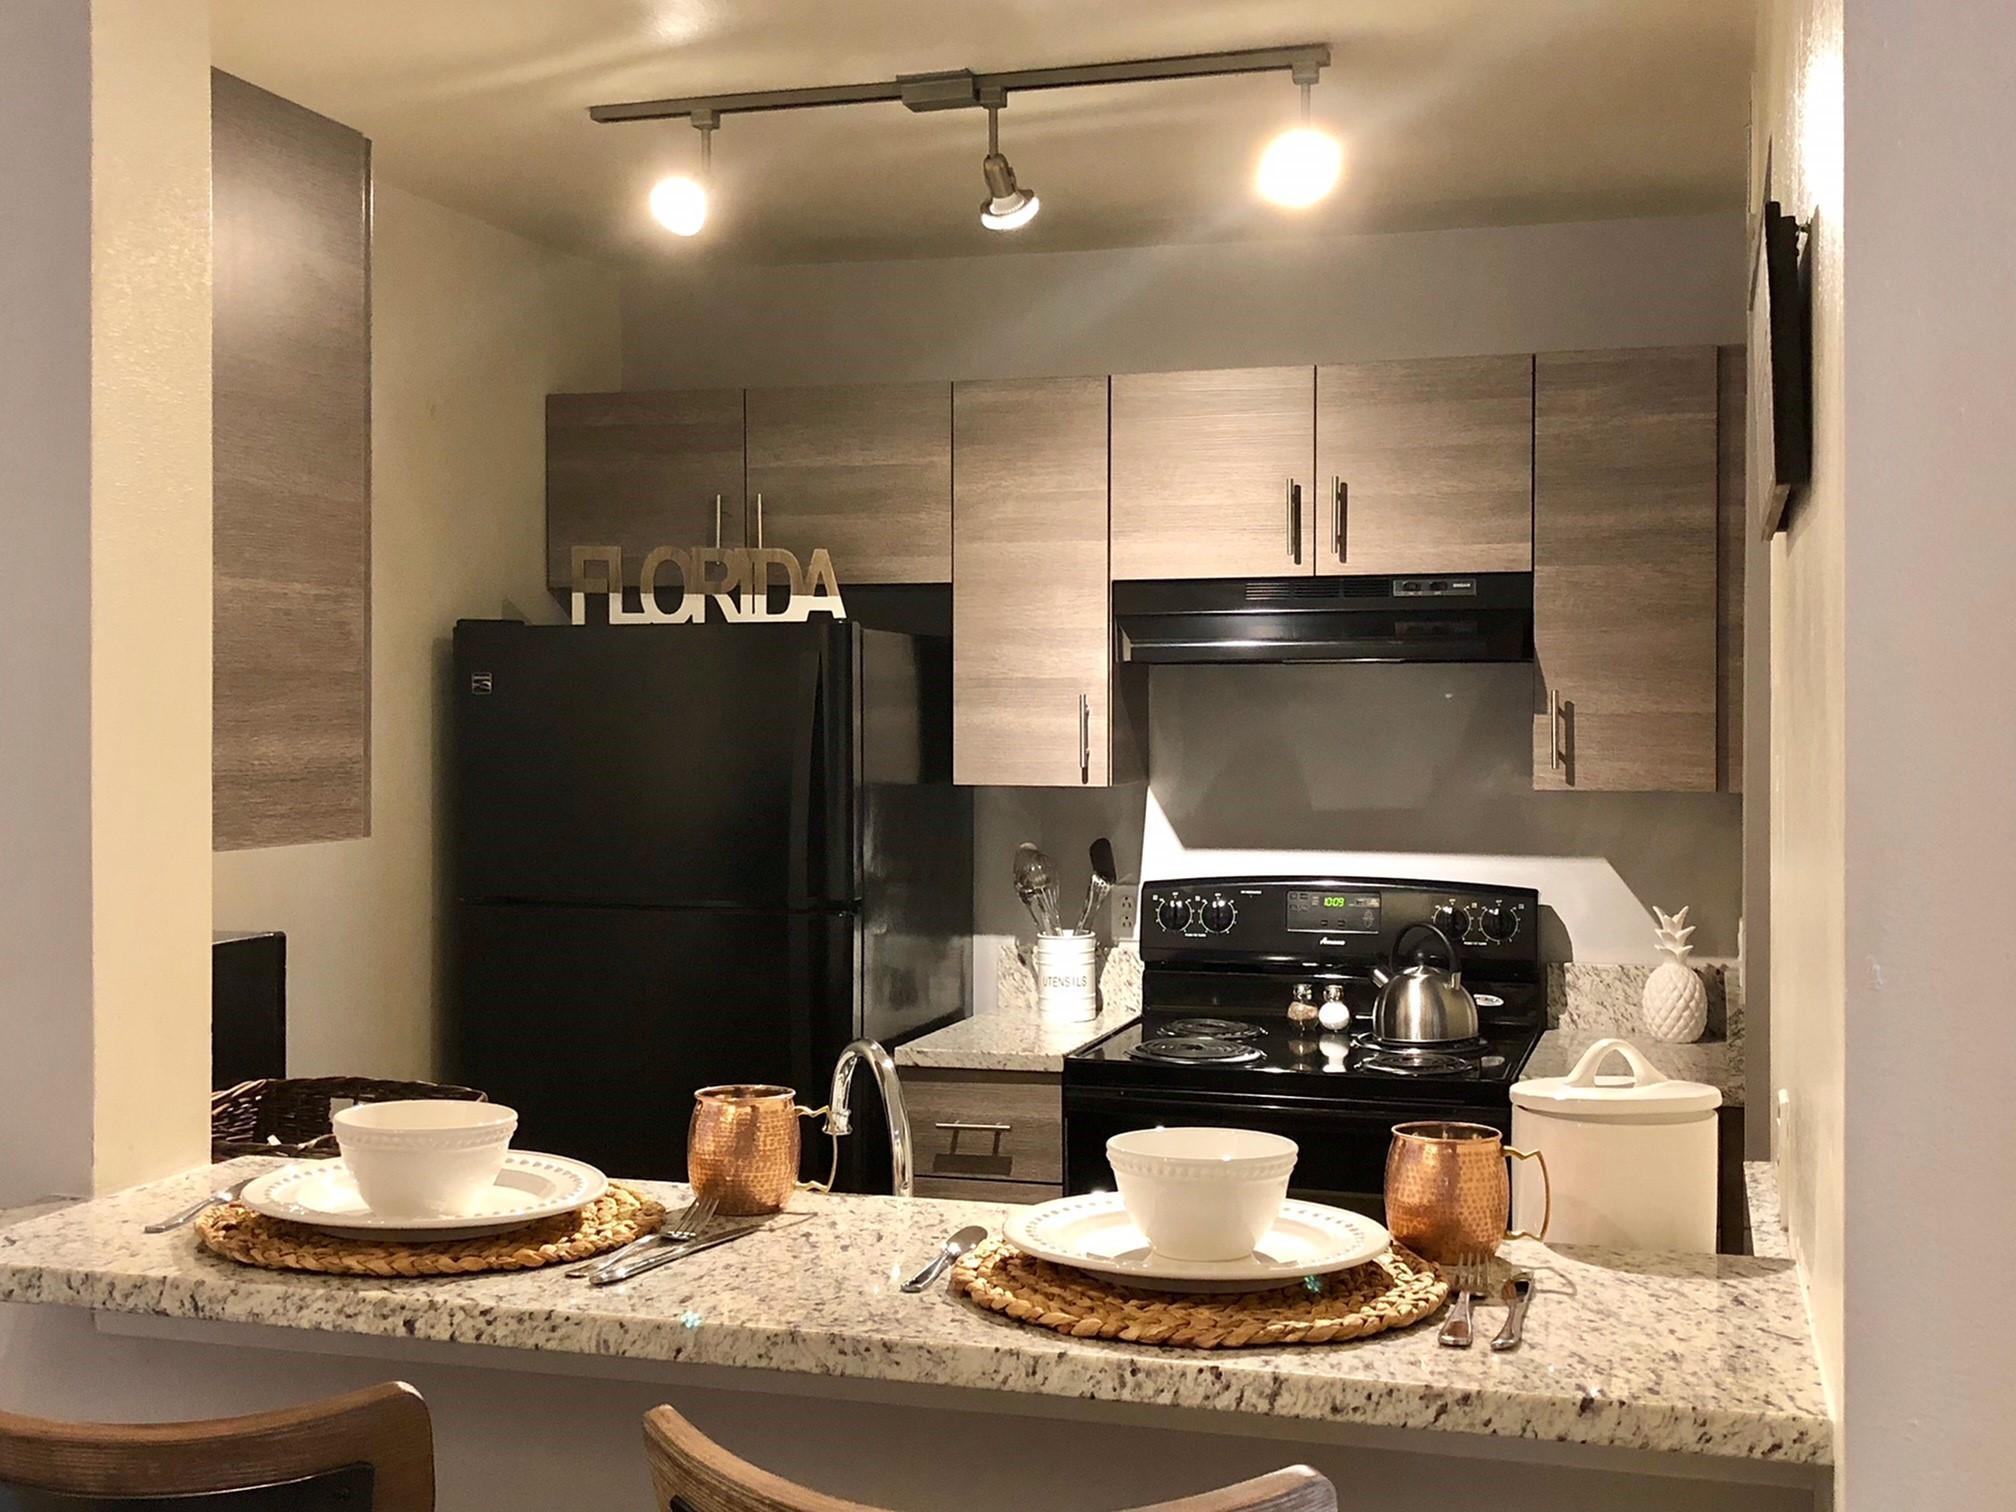 42 North Apartments image 8